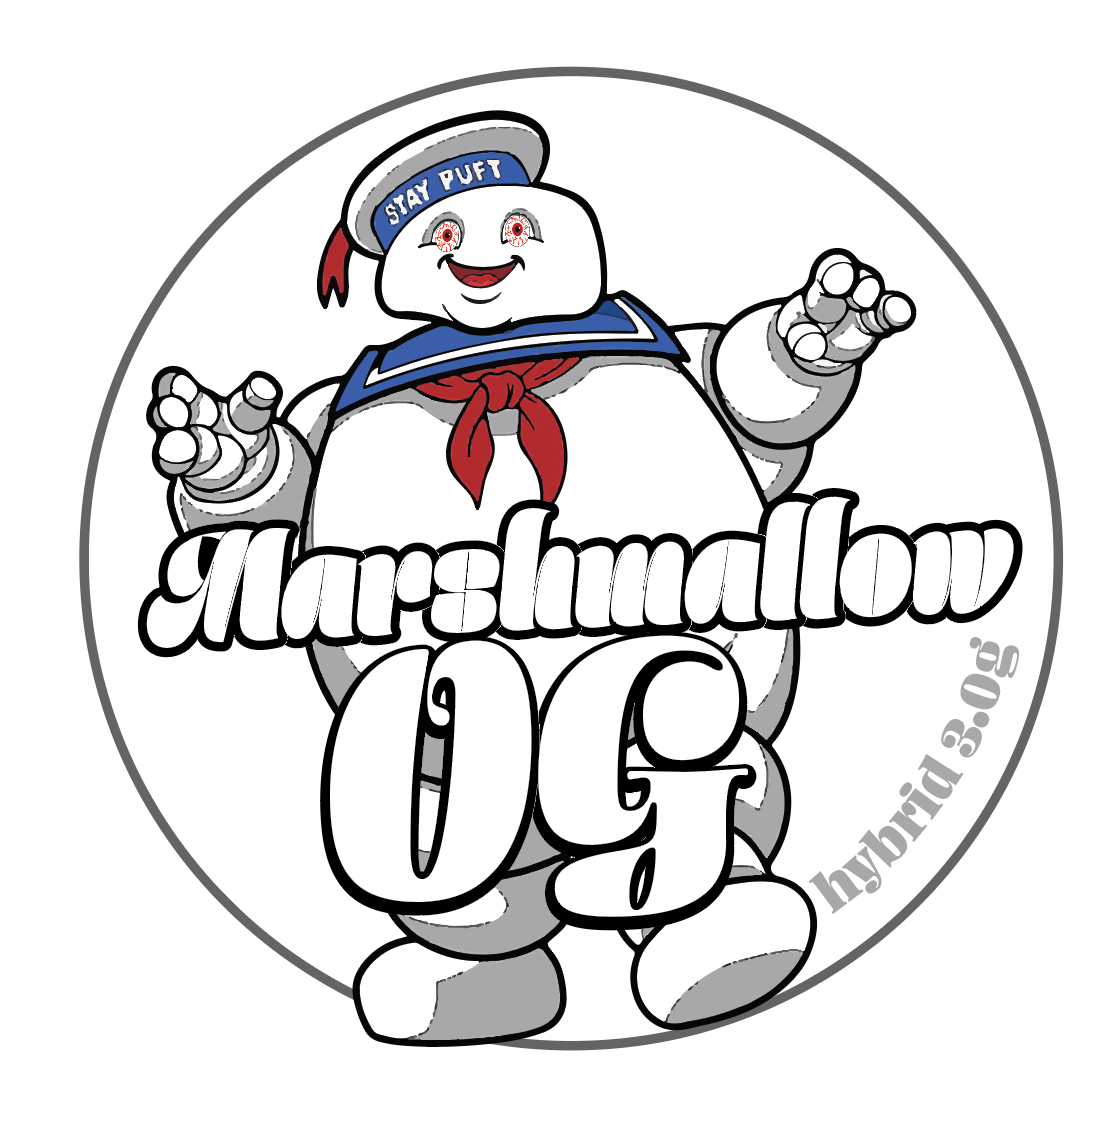 Legal Coupon - (Marshmallow OG) Optional Gift